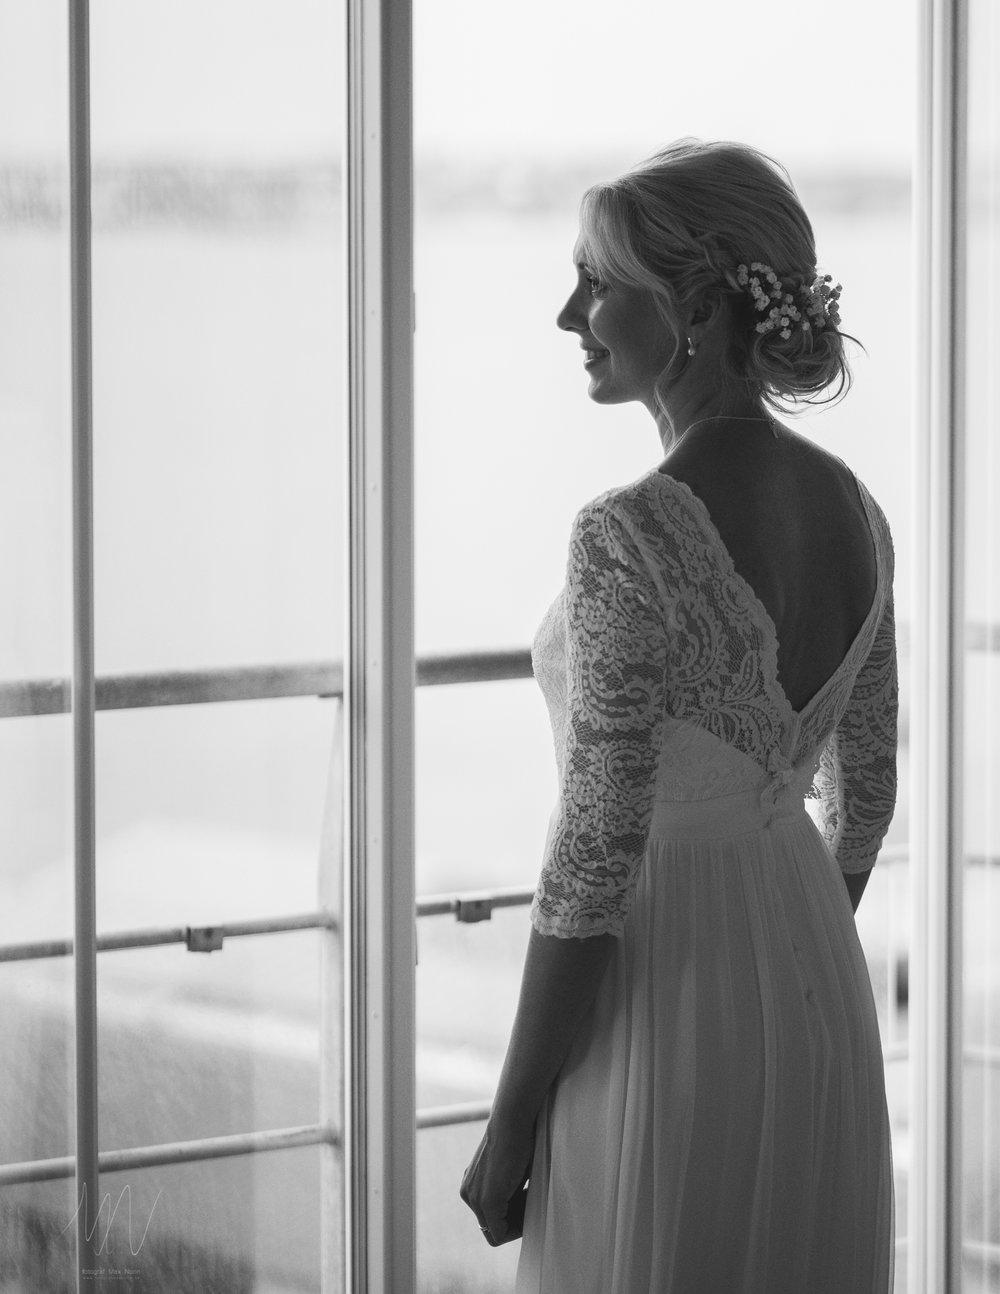 Bröllop-fotografmaxnorin.se-MariaMarcus-10.JPG